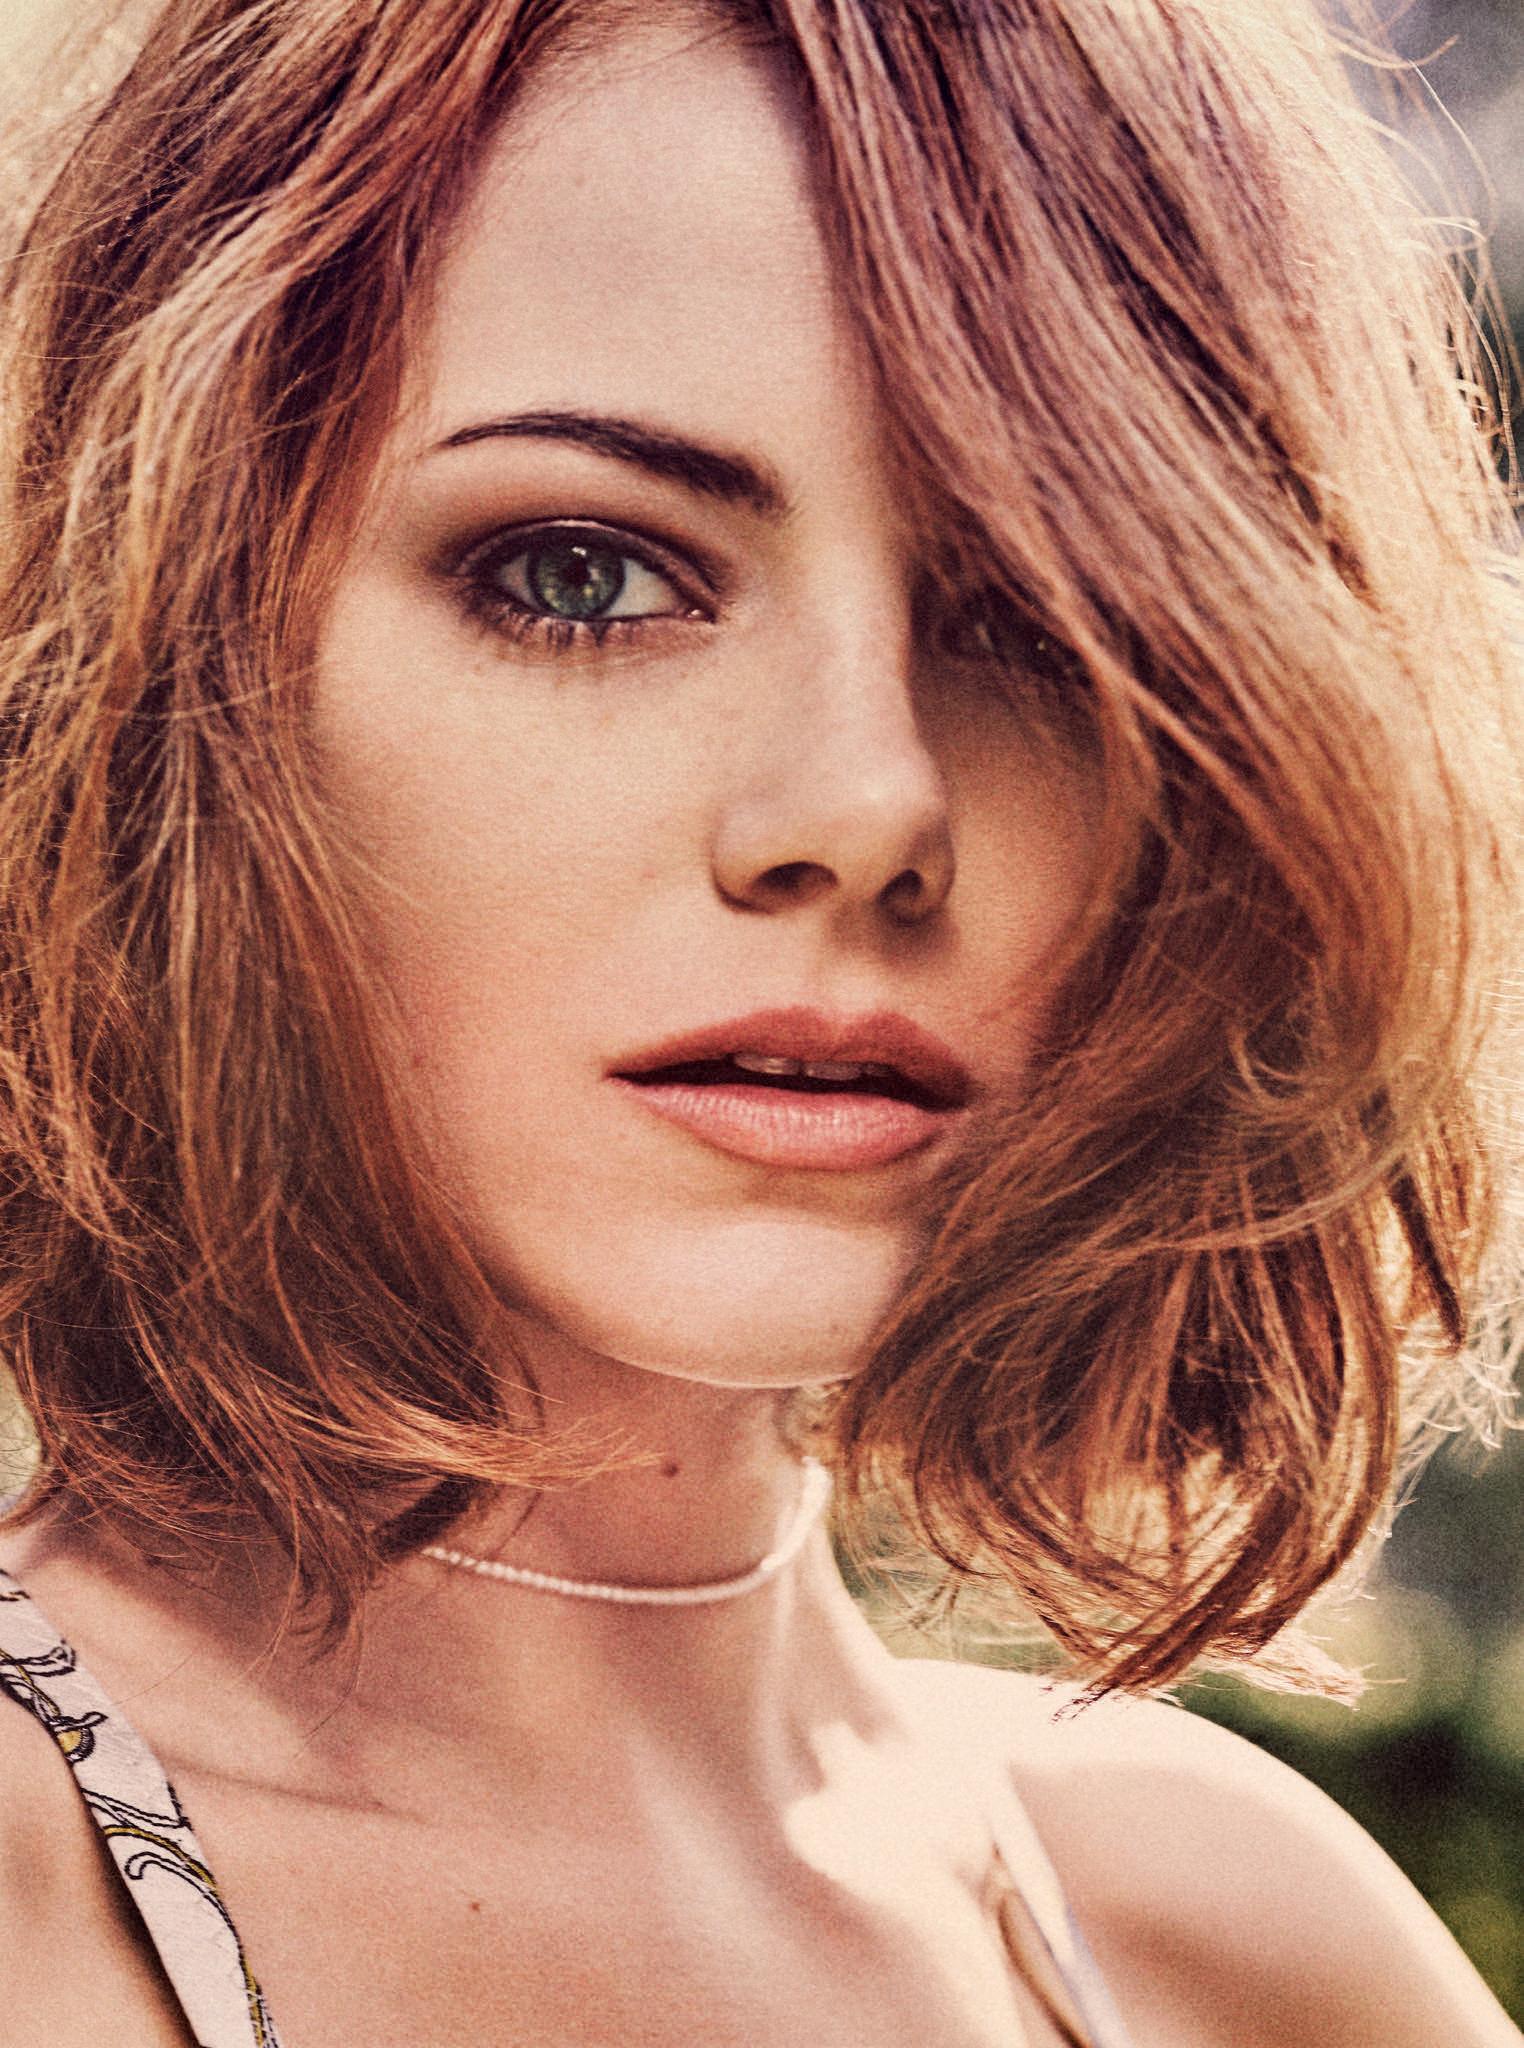 emma-stone-interview-magazine-02 – SILHOUETTEANDSTYLE Emma Stone